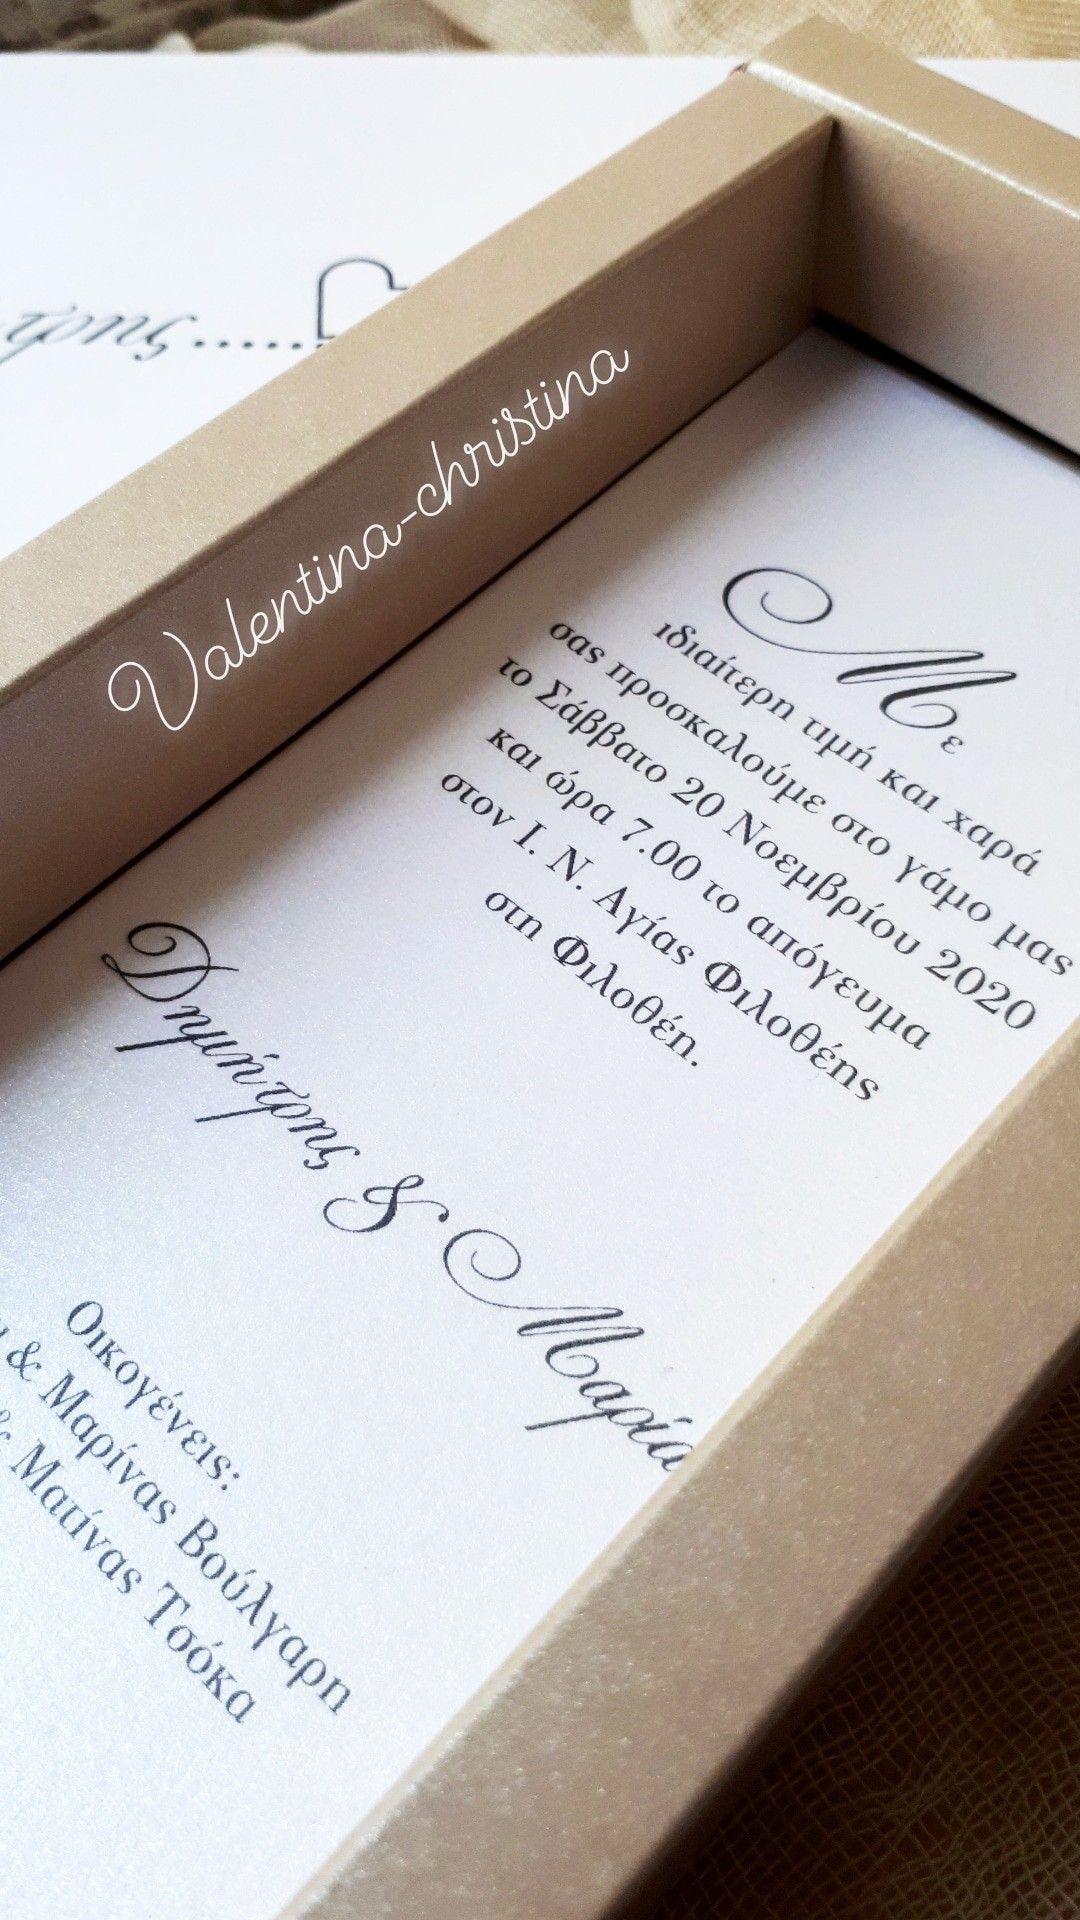 426e061f3889 Πρωτότυπα προσκλητήρια γάμου σε κουτί συρταρωτο μαζί με  μπομπονιέρα!!!ιδιαίτερες επιλογές by valentina